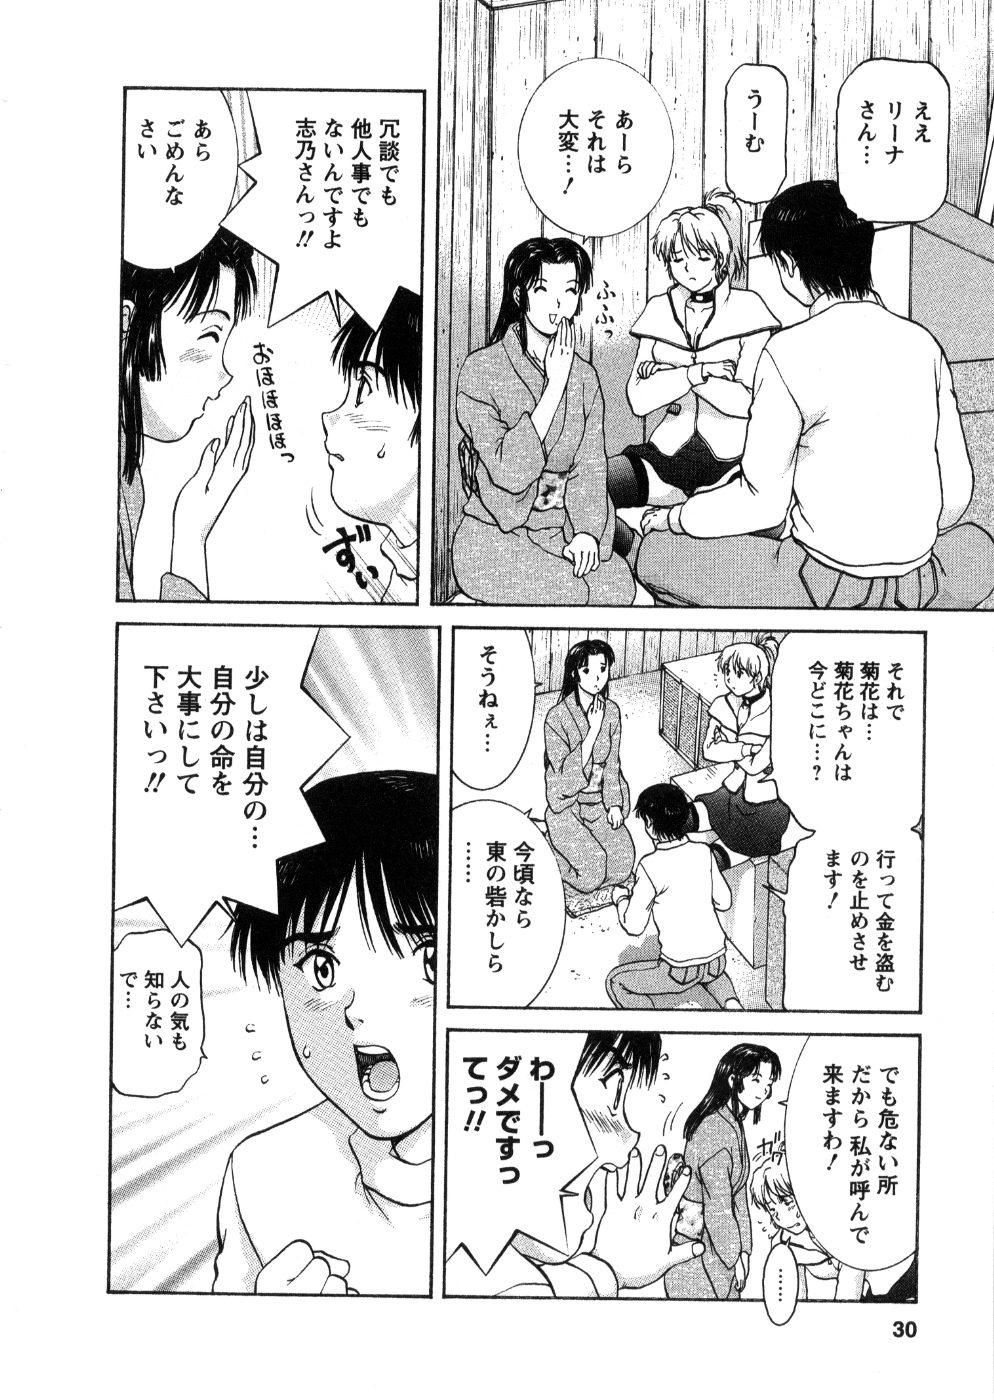 Oneechan-tachi ga Yatte Kuru 03 31